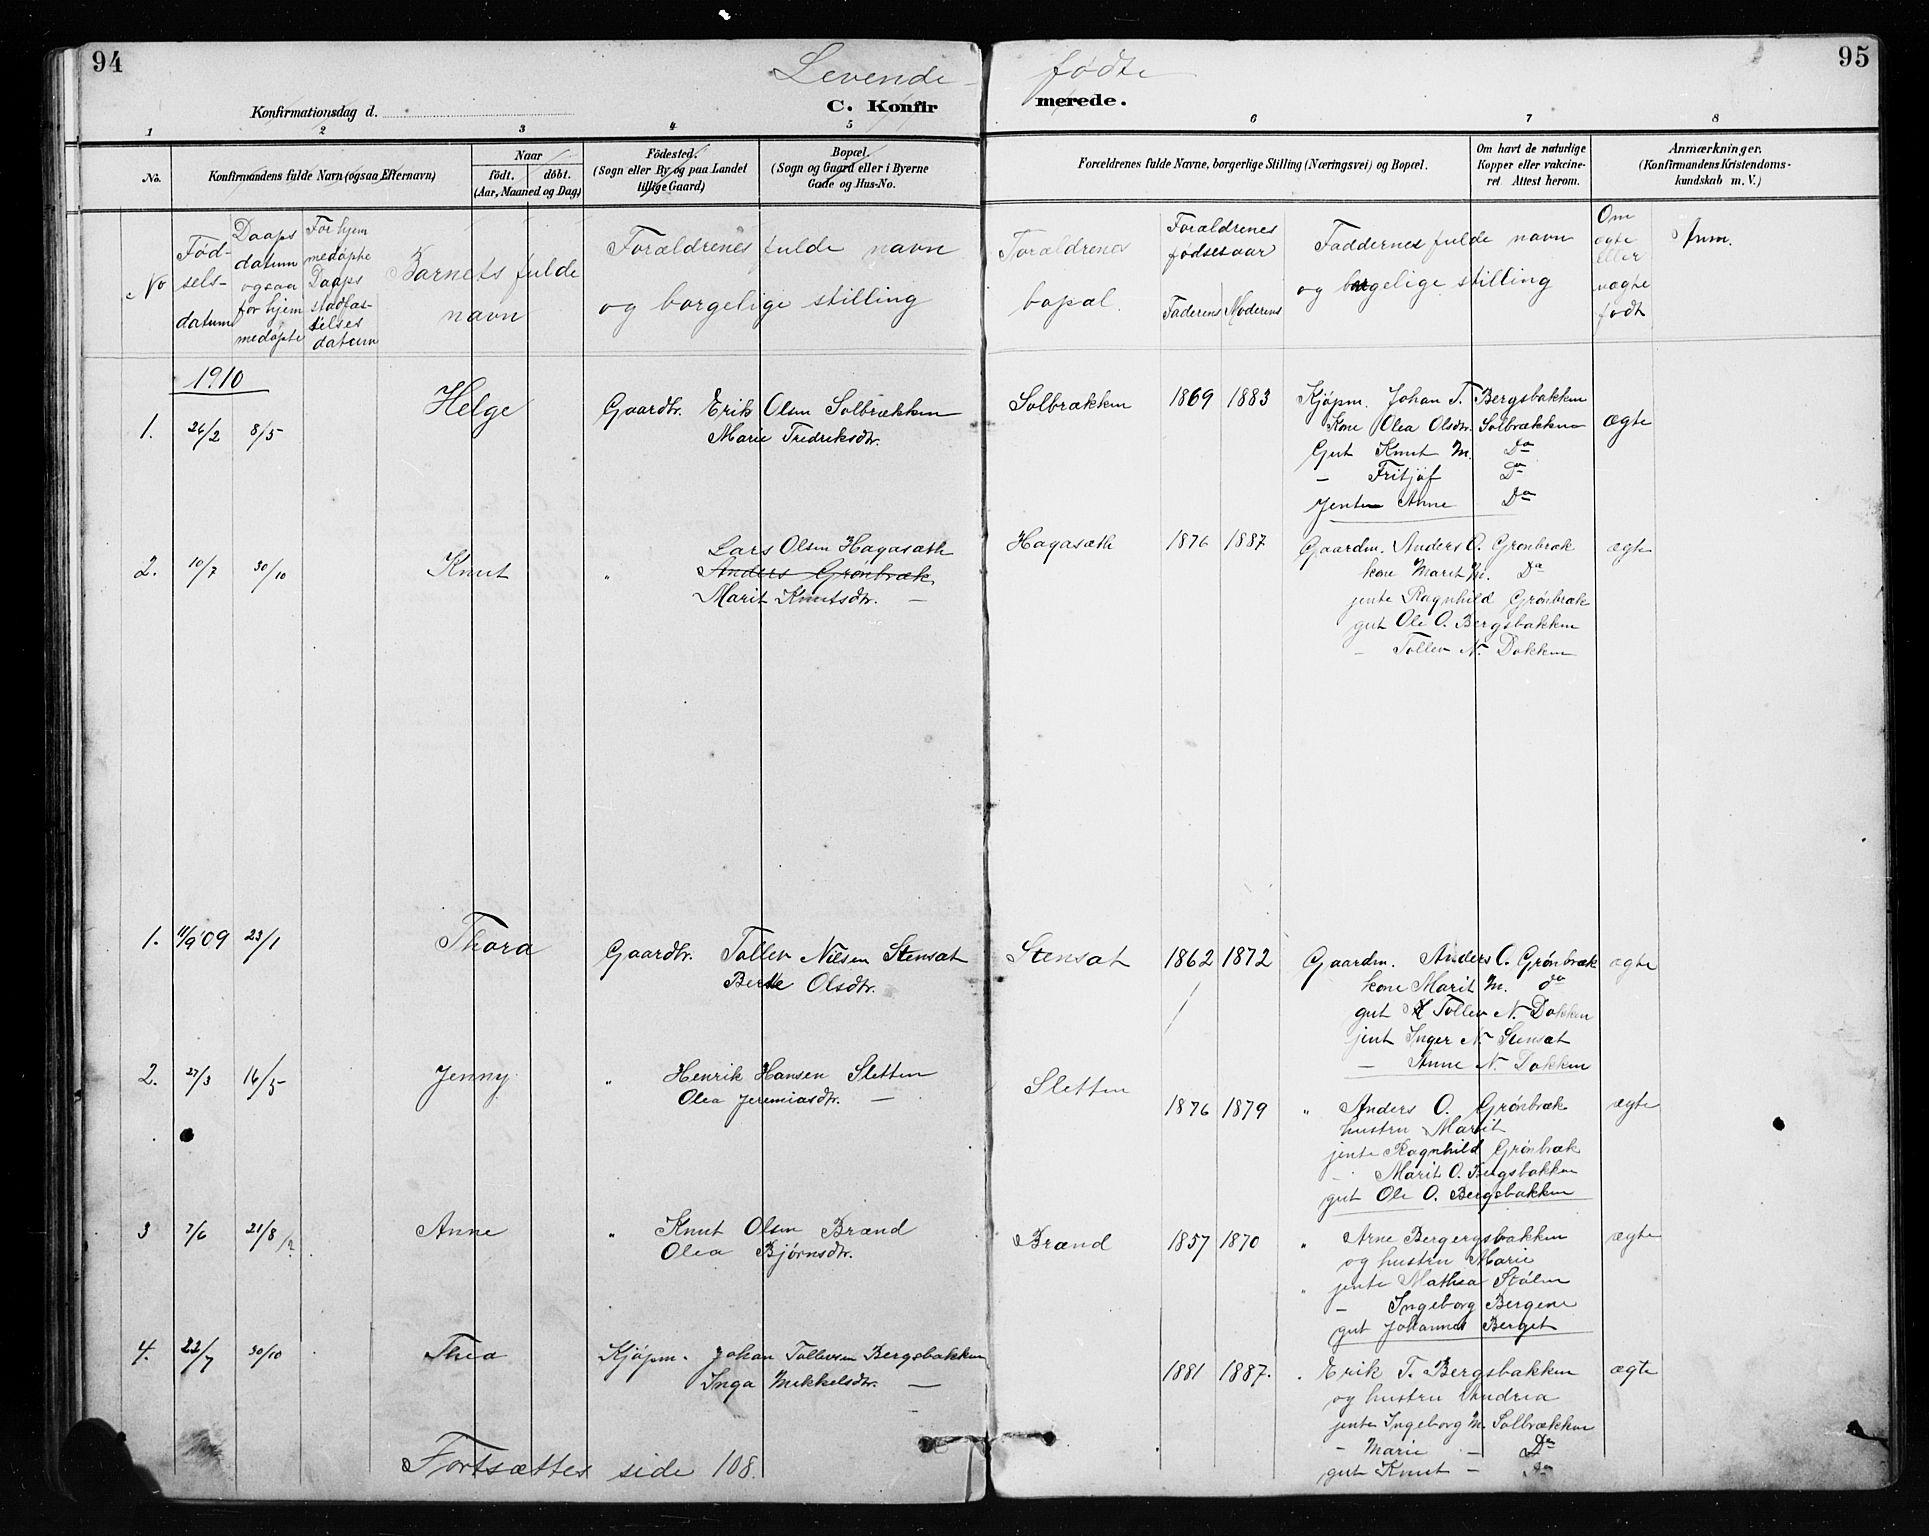 SAH, Etnedal prestekontor, H/Ha/Hab/Habb/L0001: Klokkerbok nr. II 1, 1894-1911, s. 94-95